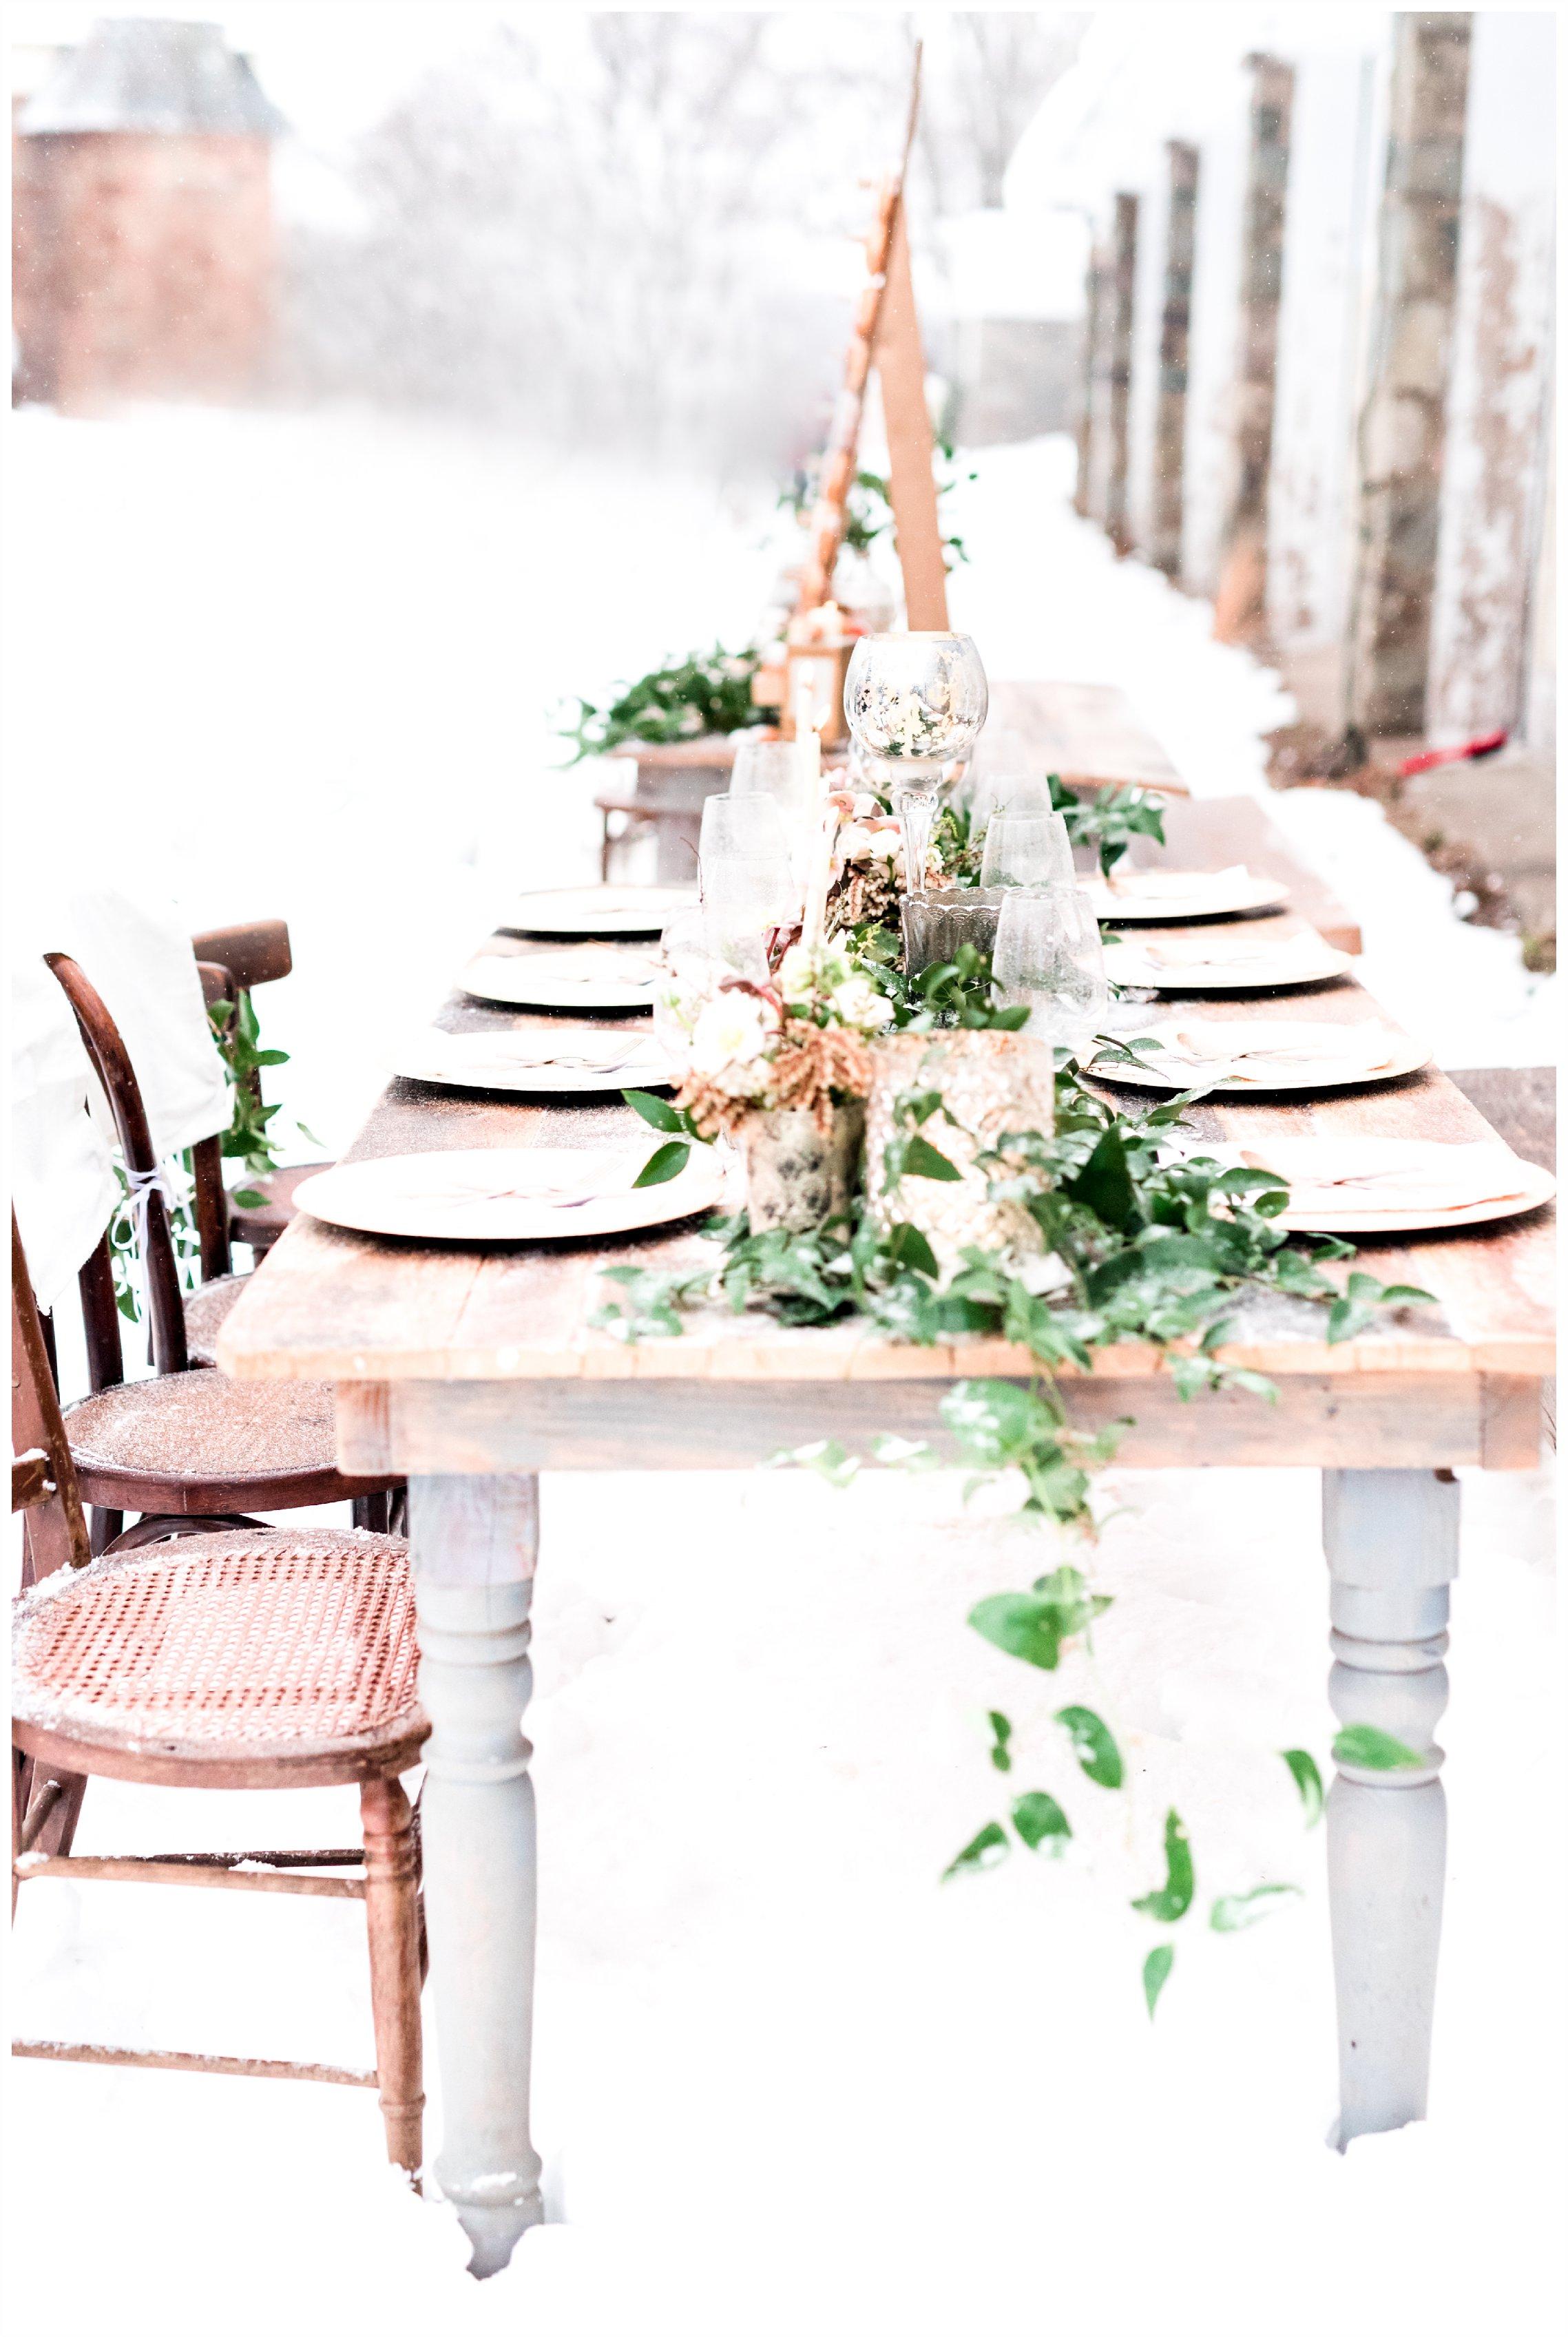 beautiful barn style wedding scape